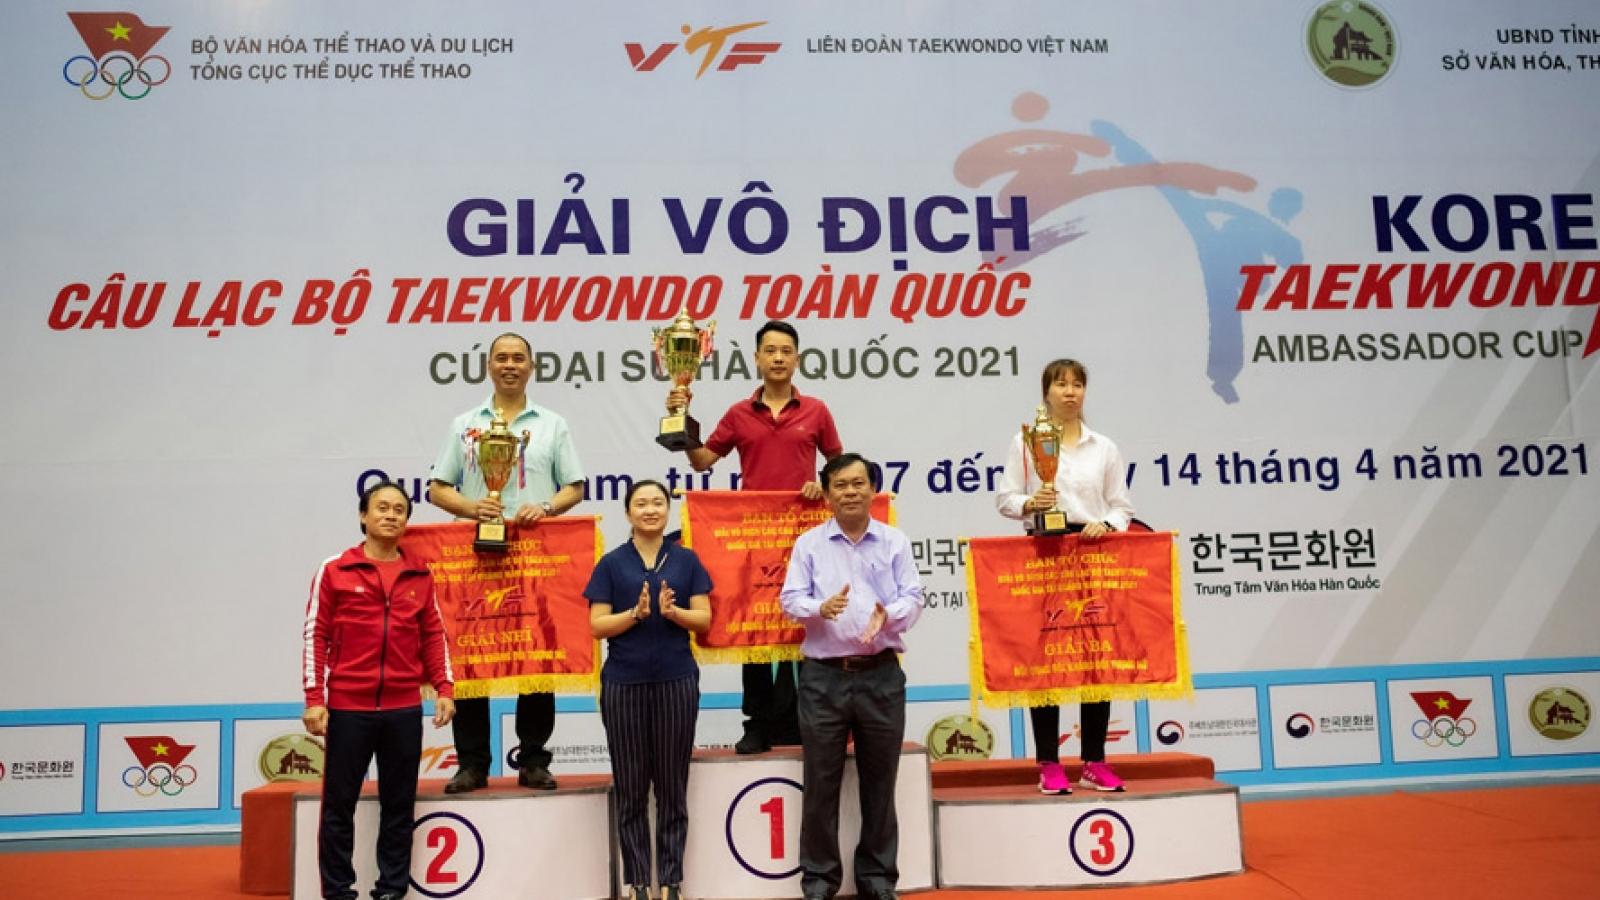 Korean Taekwondo Ambassador Cup 2021 wrapped up